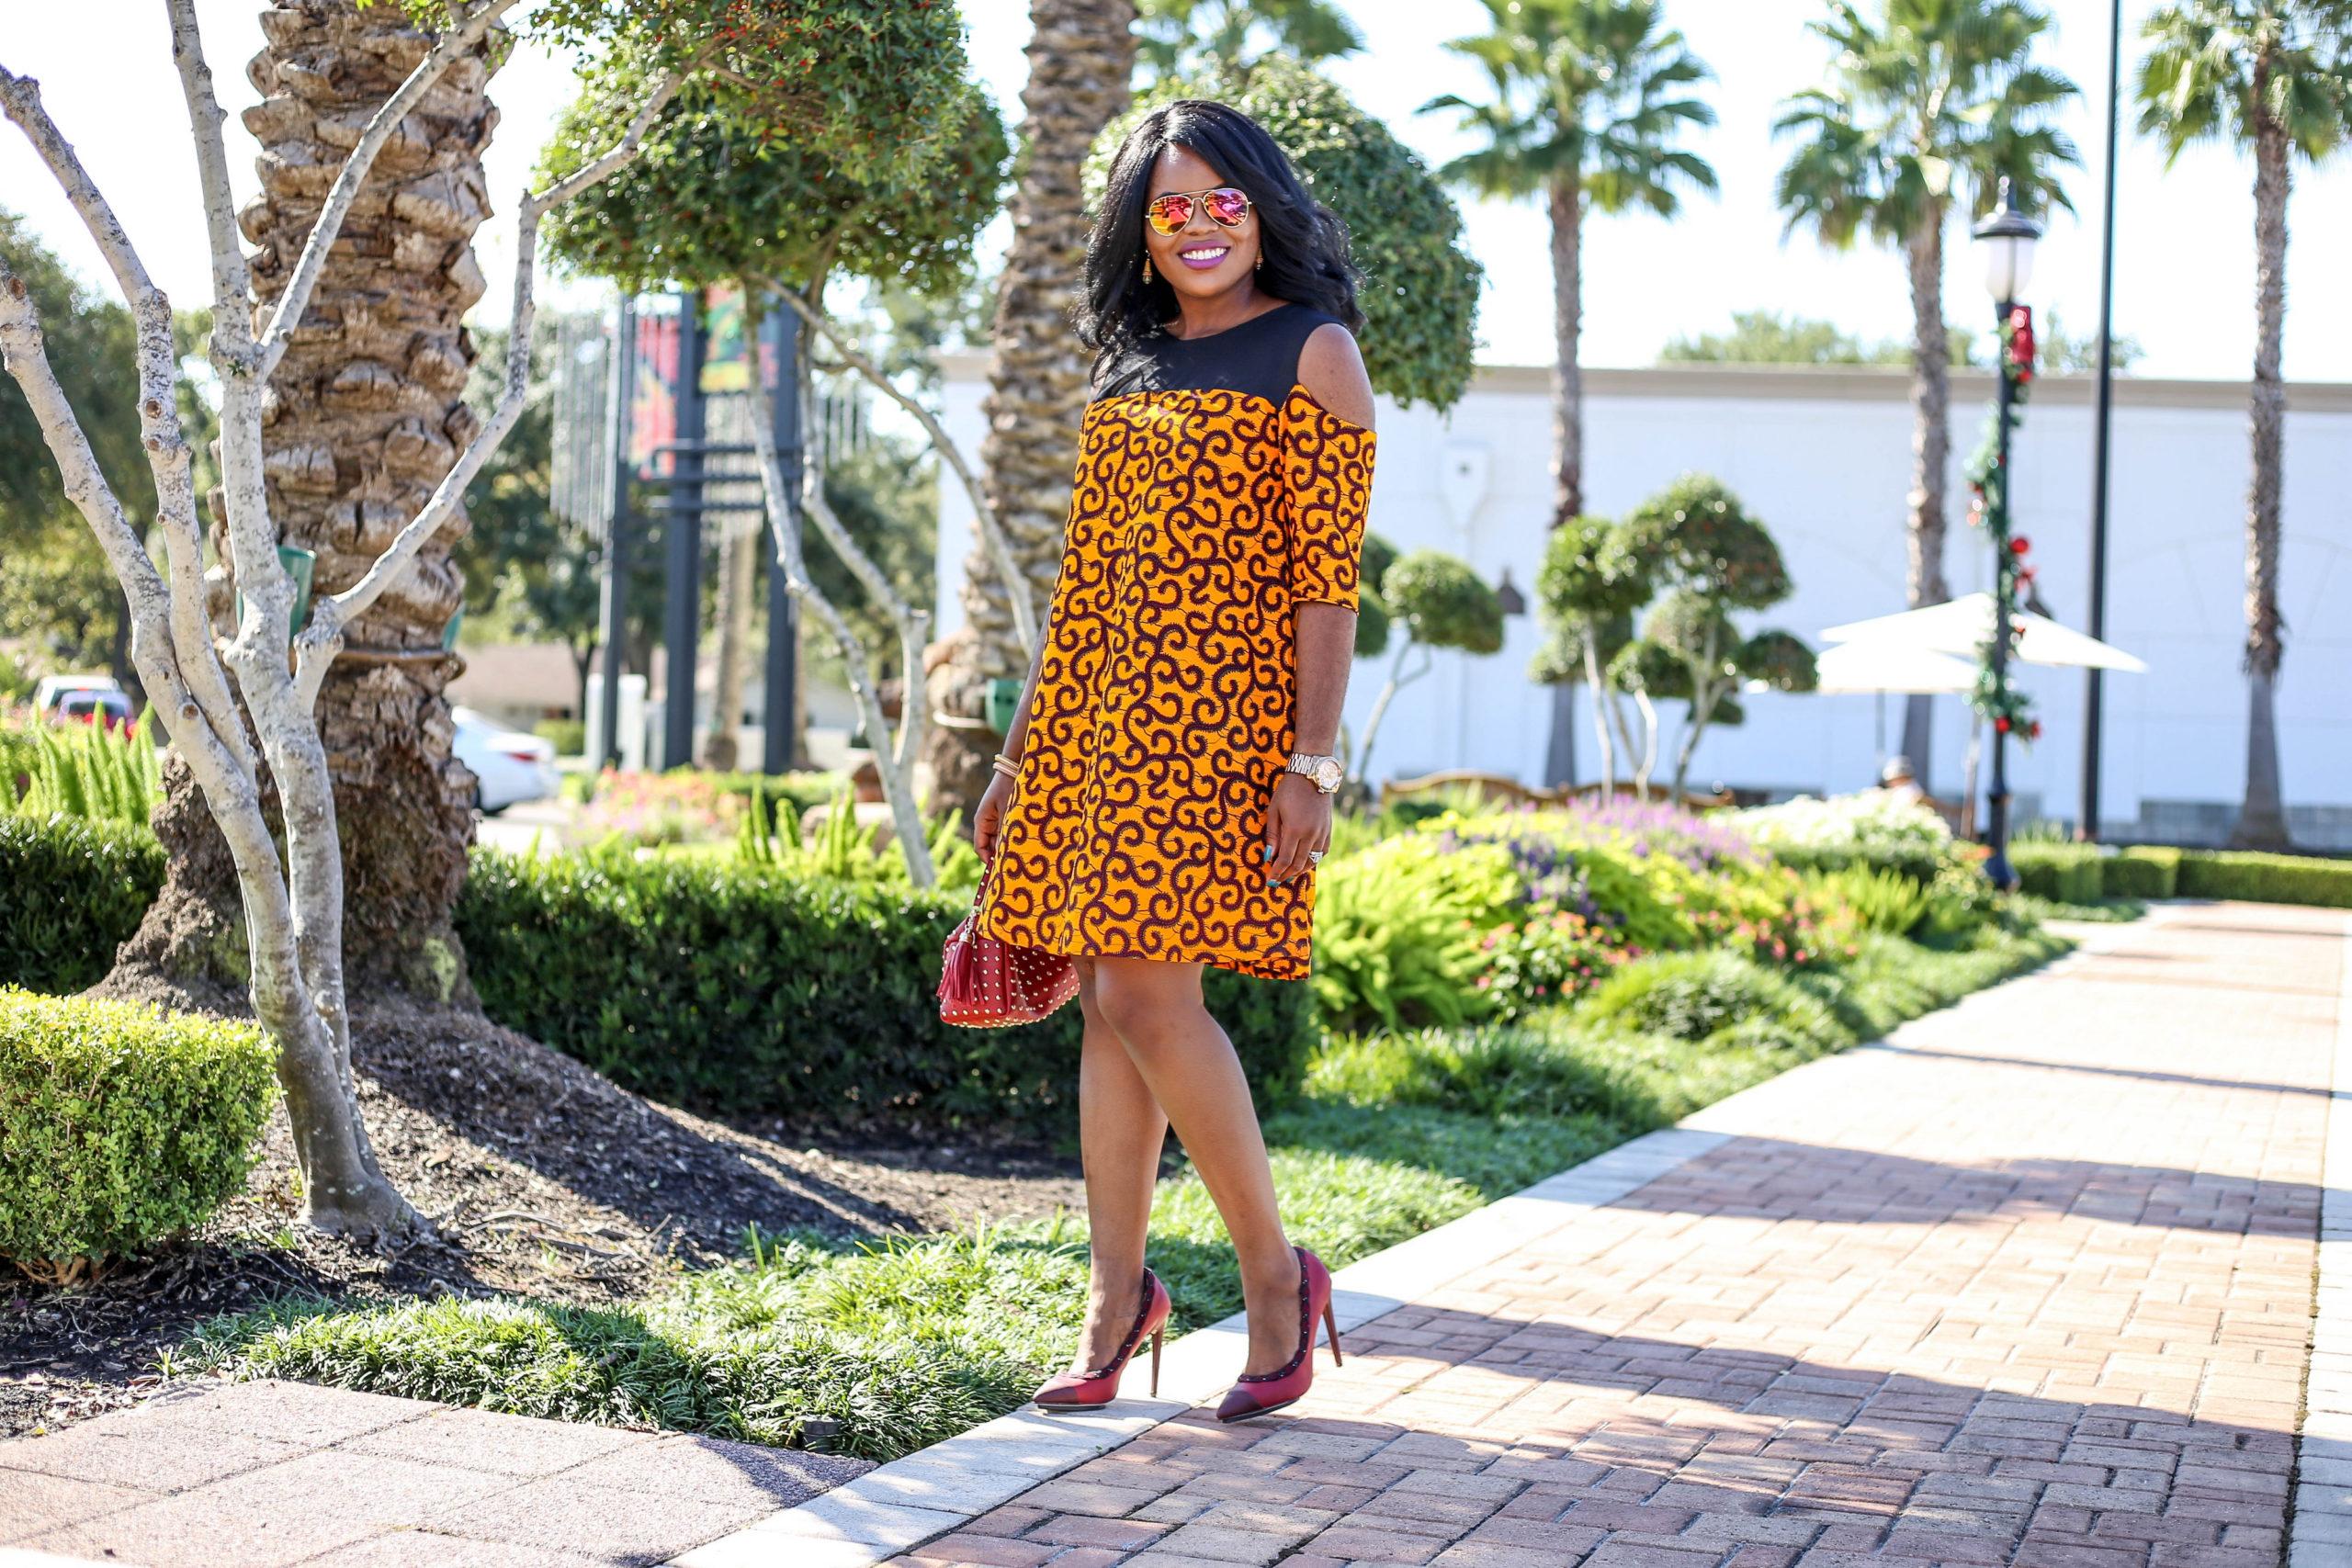 Chigi's World African Print Ankara Shift Dress Rock Stud Handbag GX Gwen Stefani Shoedazzle Pumps